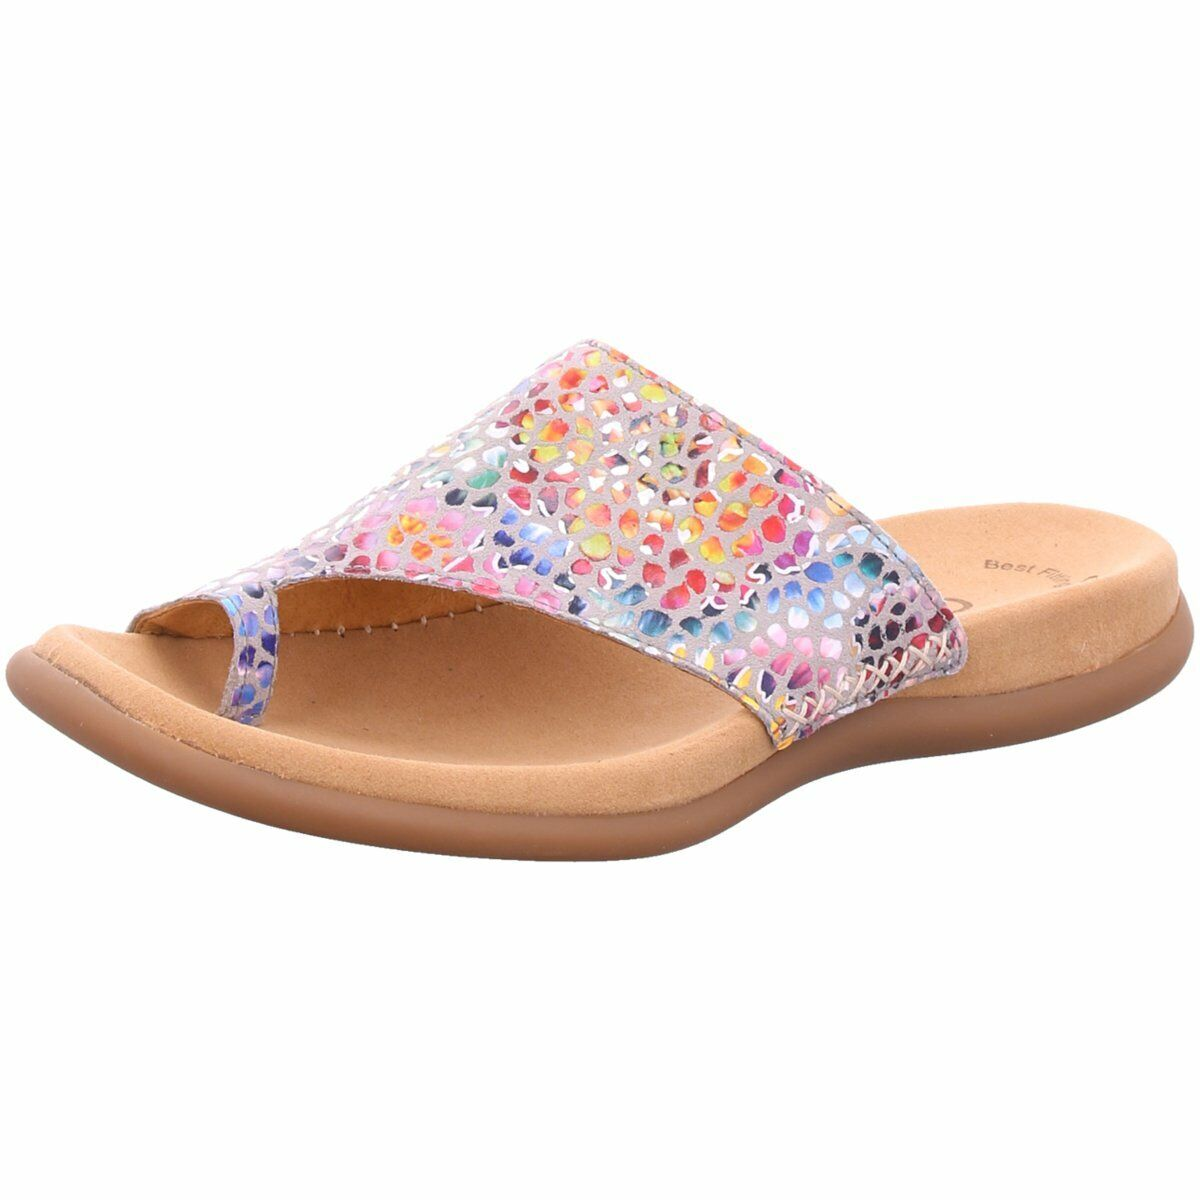 Holly Jolly Damen Sandaletten 23.700.59 bunt 663809